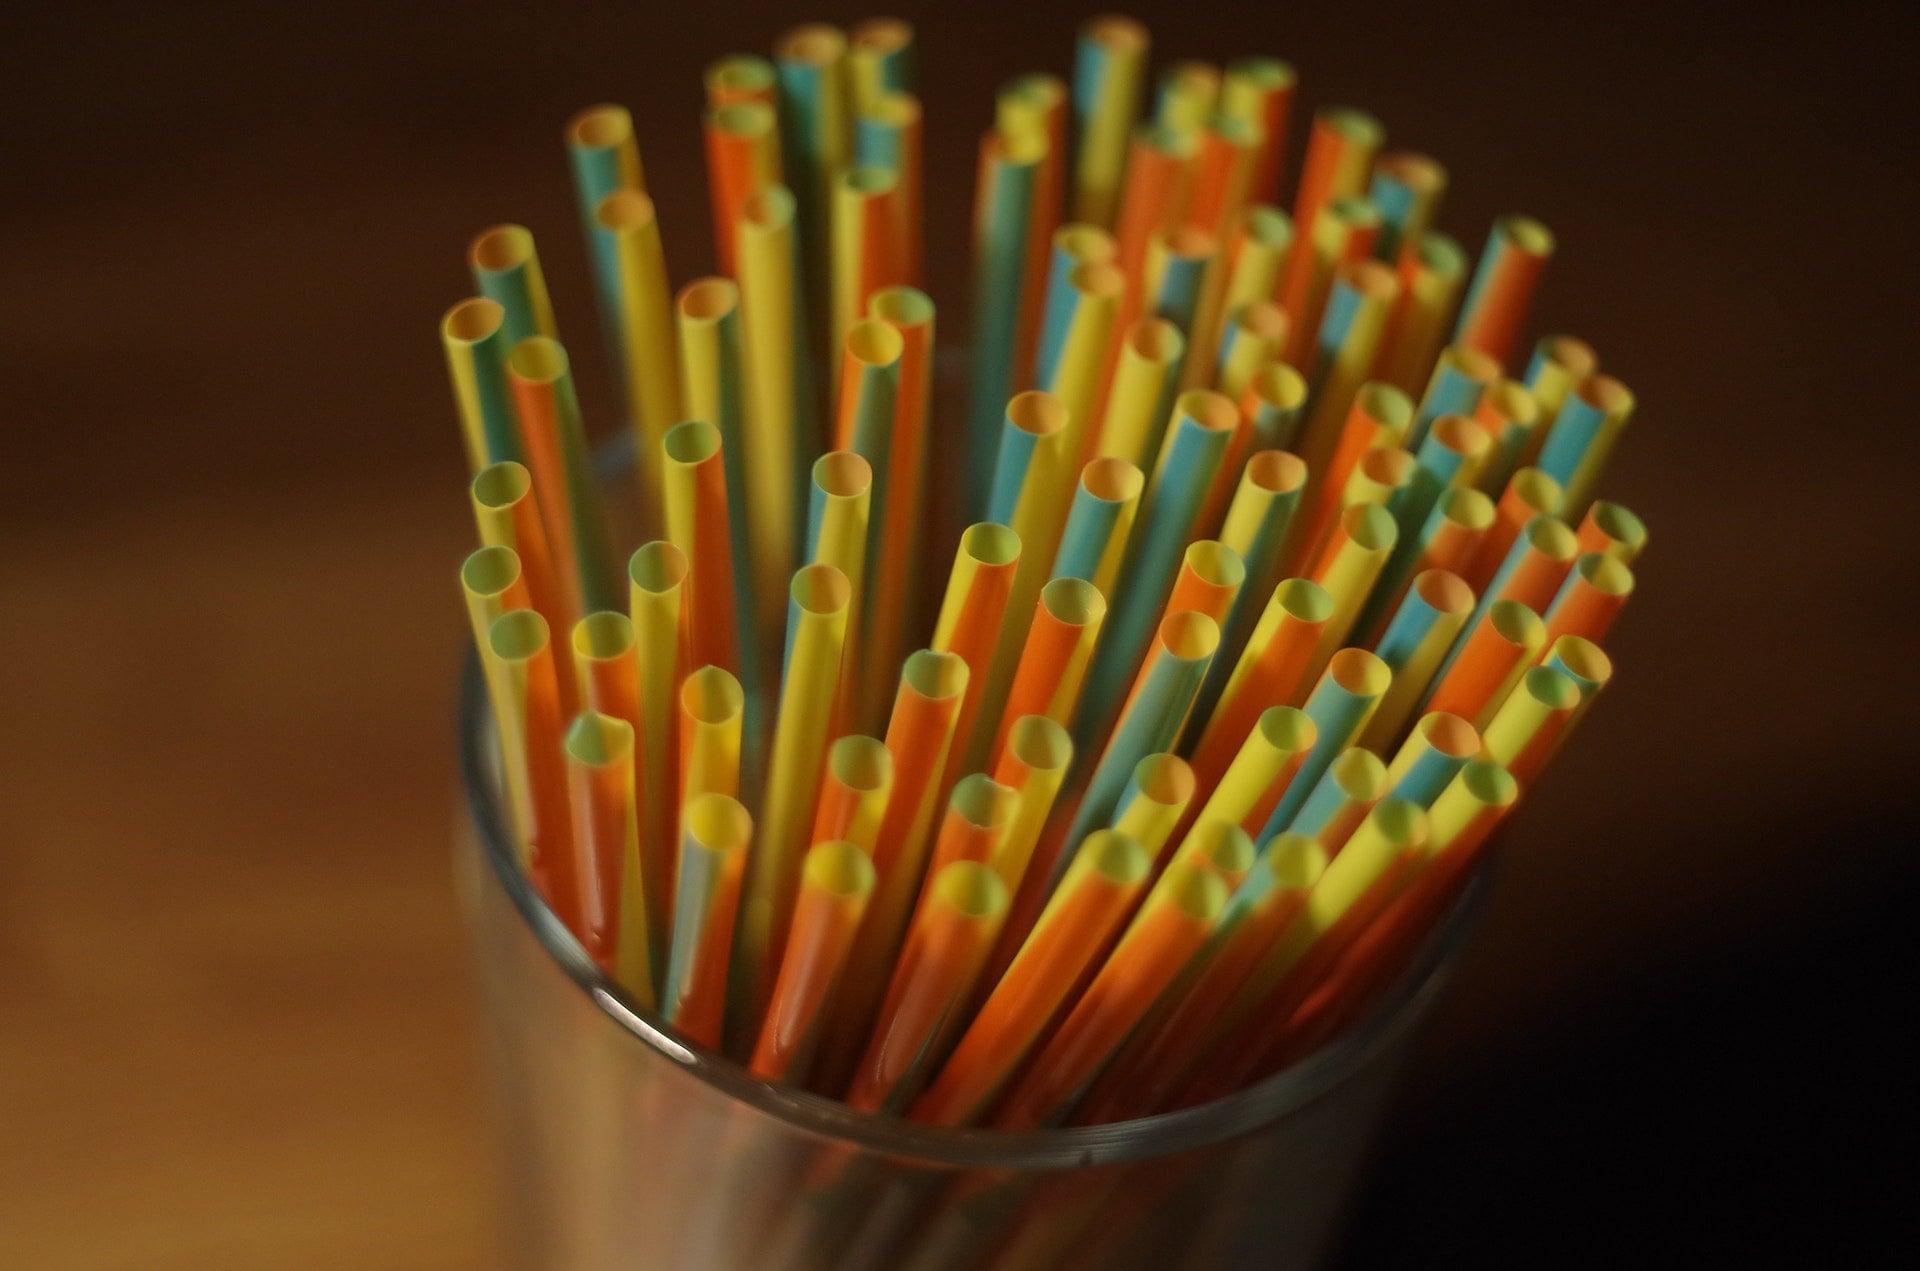 不鏽鋼吸管及鋁、鈦合金吸管,讓人無法接受的3個原因 colorful plastic straw on a glass container